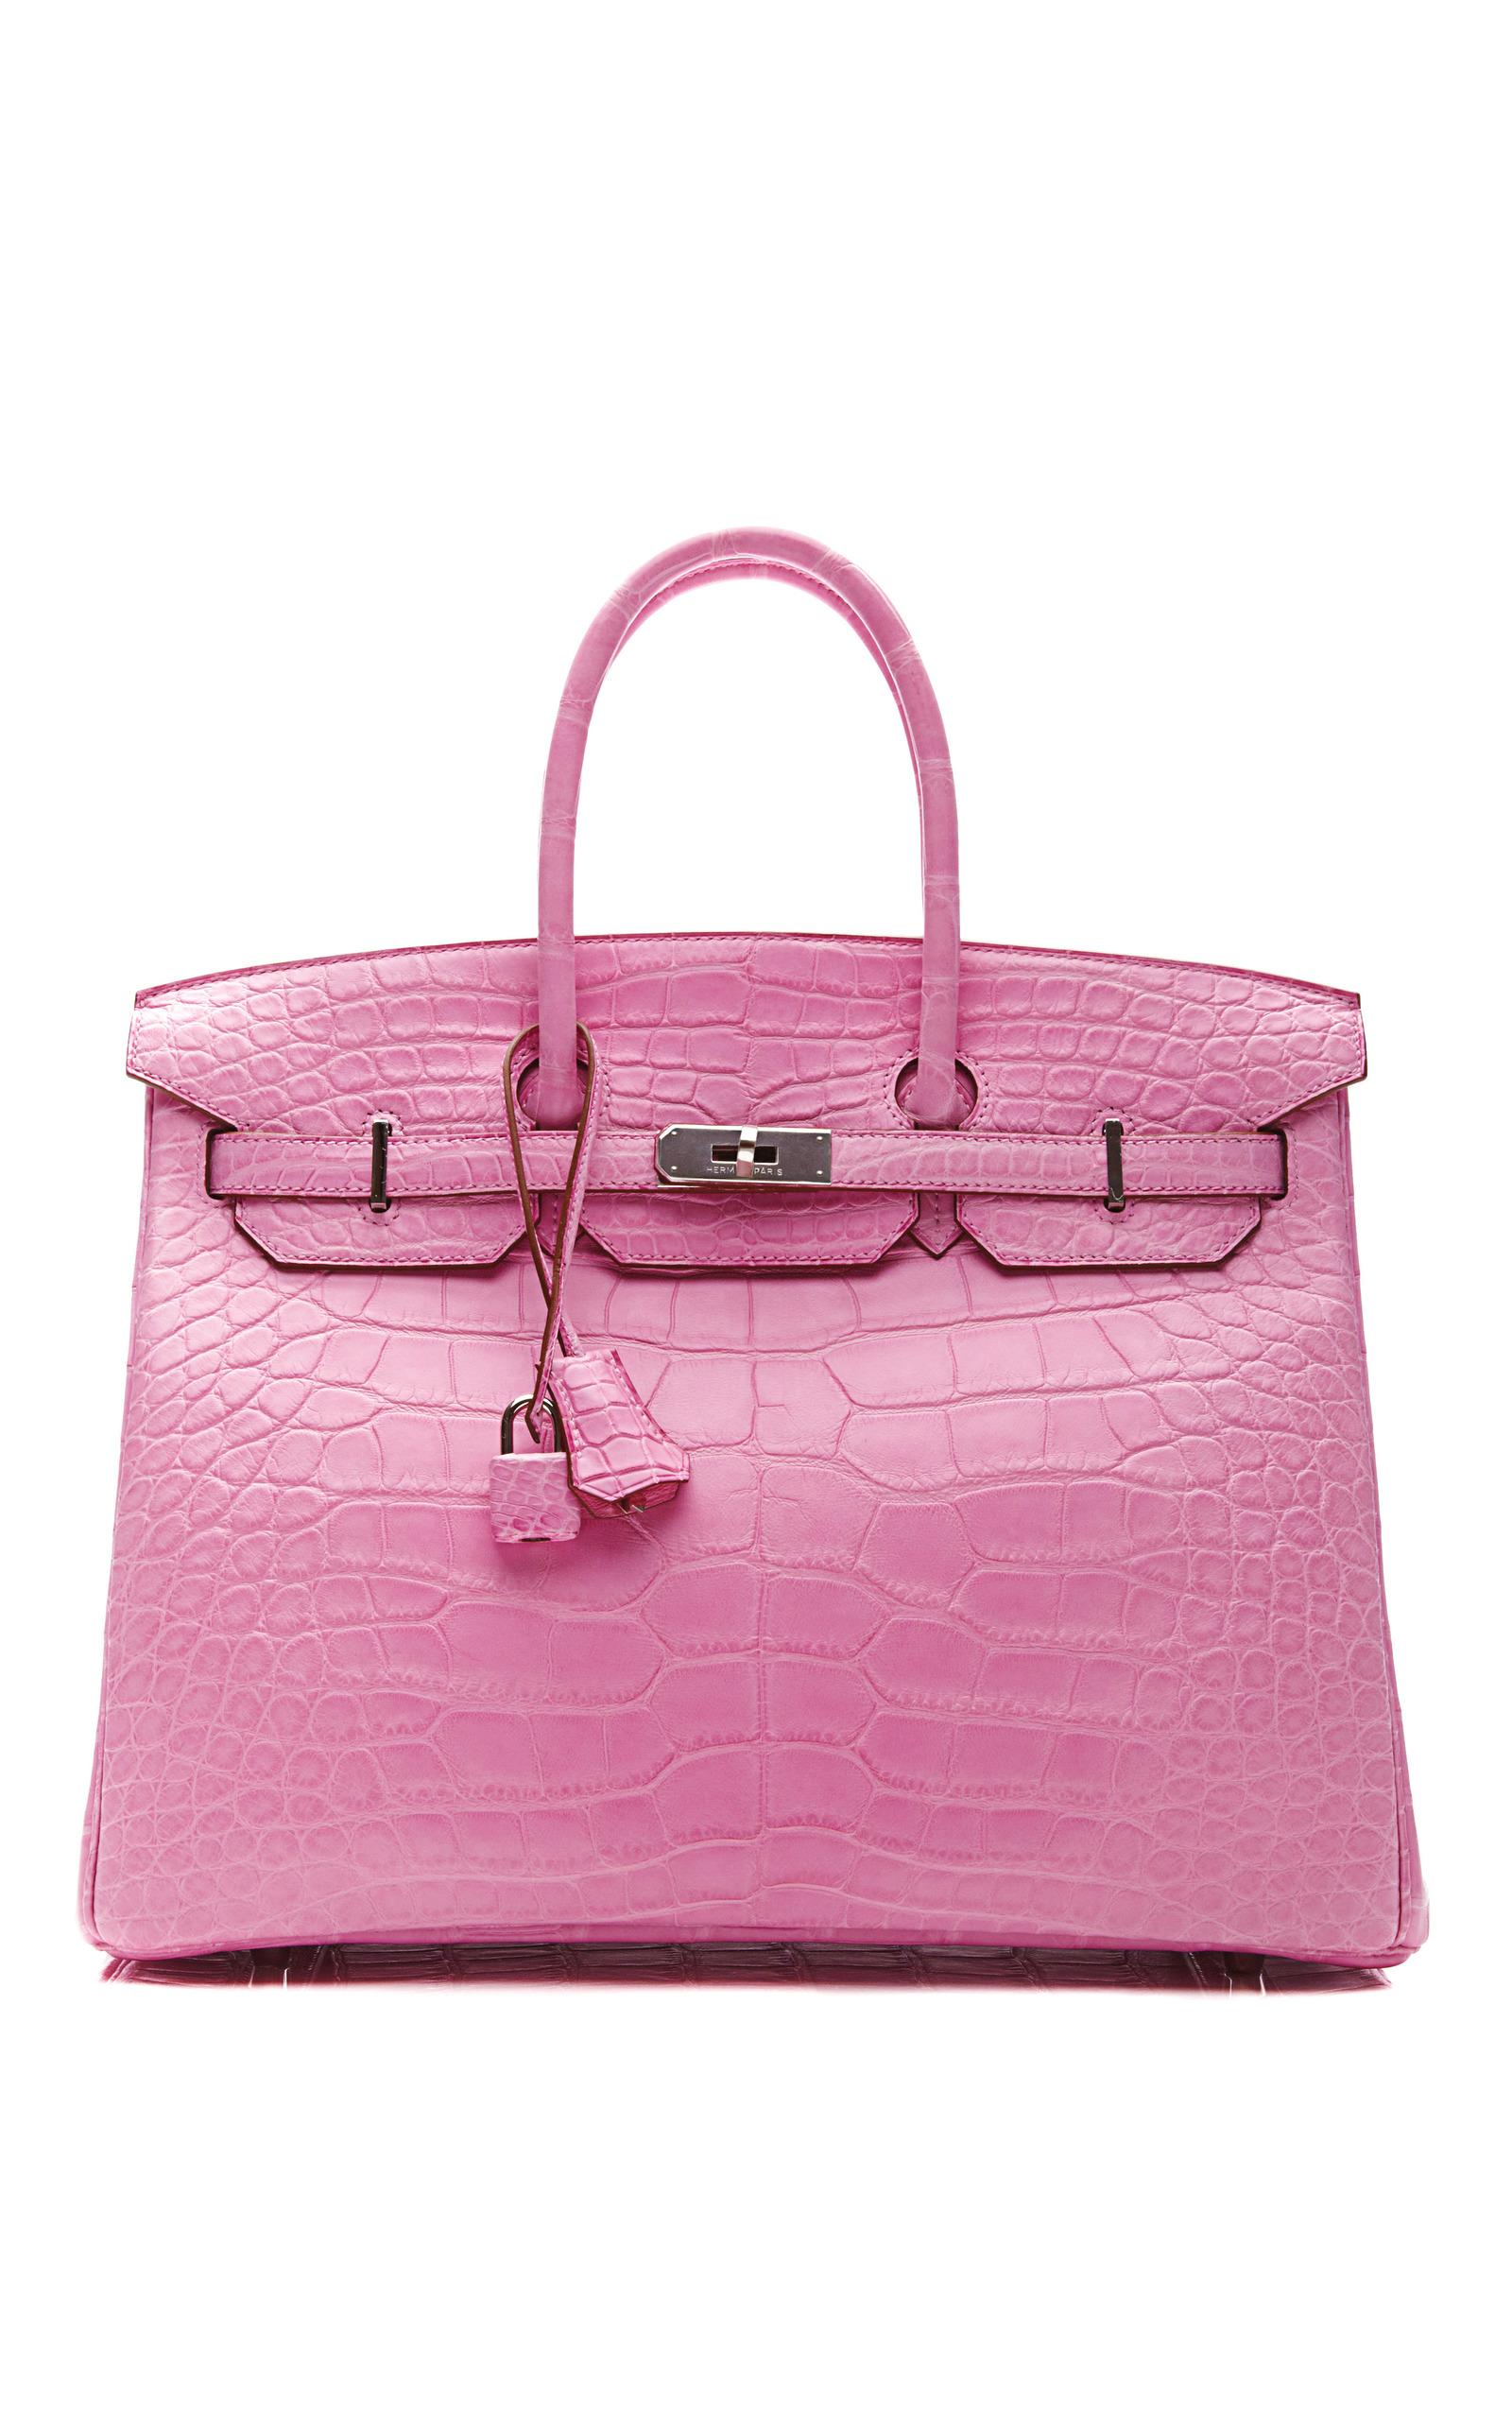 ec969a0bc523 Hermes Vintage35Cm Matte 5P Bubblegum Pink Alligator Birkin. CLOSE. Loading